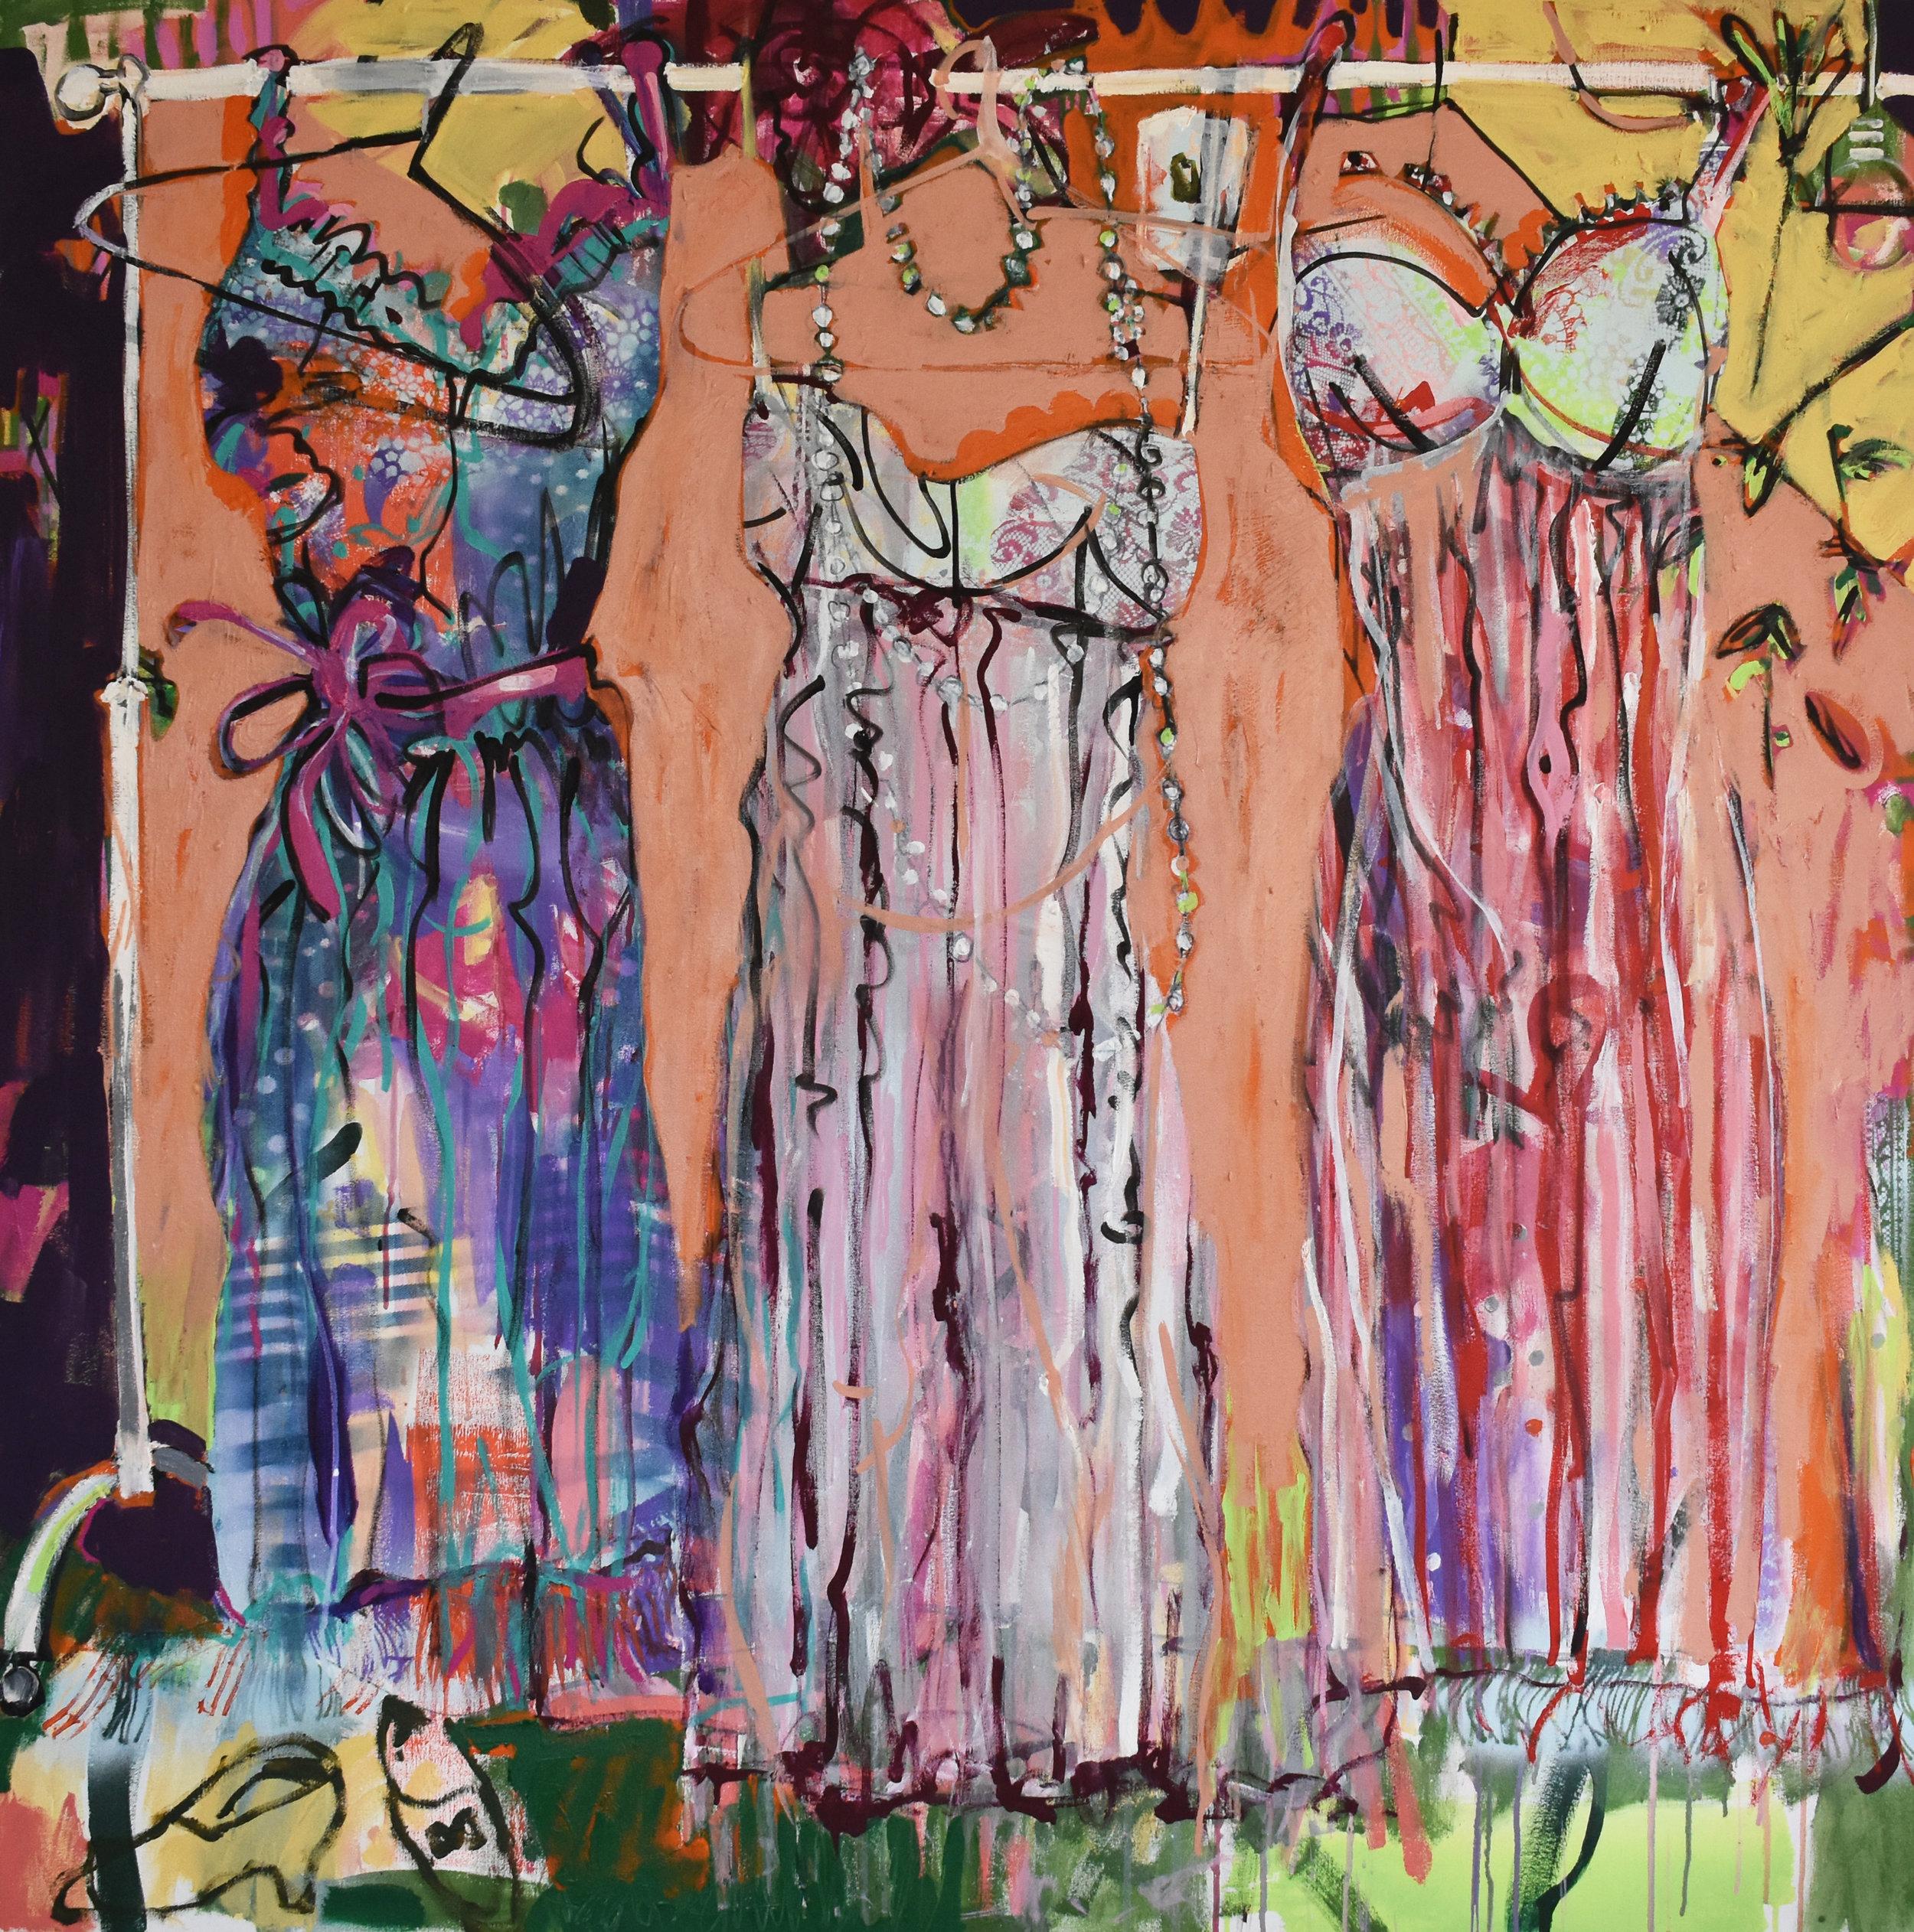 PICK ME. 2019. Acrylic on canvas. 140 x 140cm  Close ups of DRESS ME